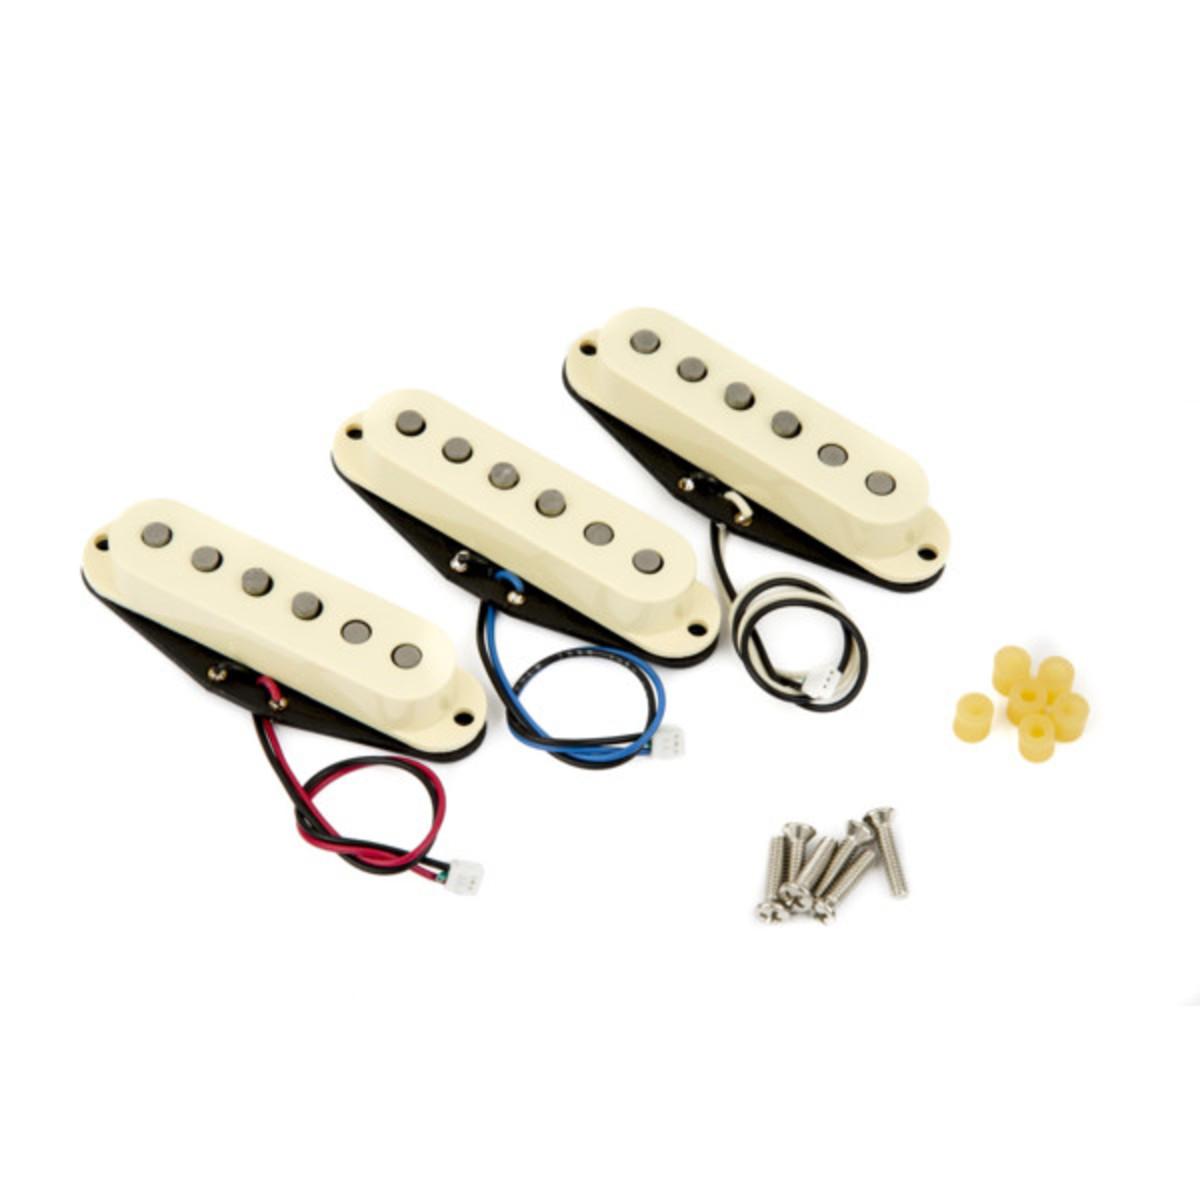 Fender Texas Special Solderless Stratocaster Pickups At Gear4music